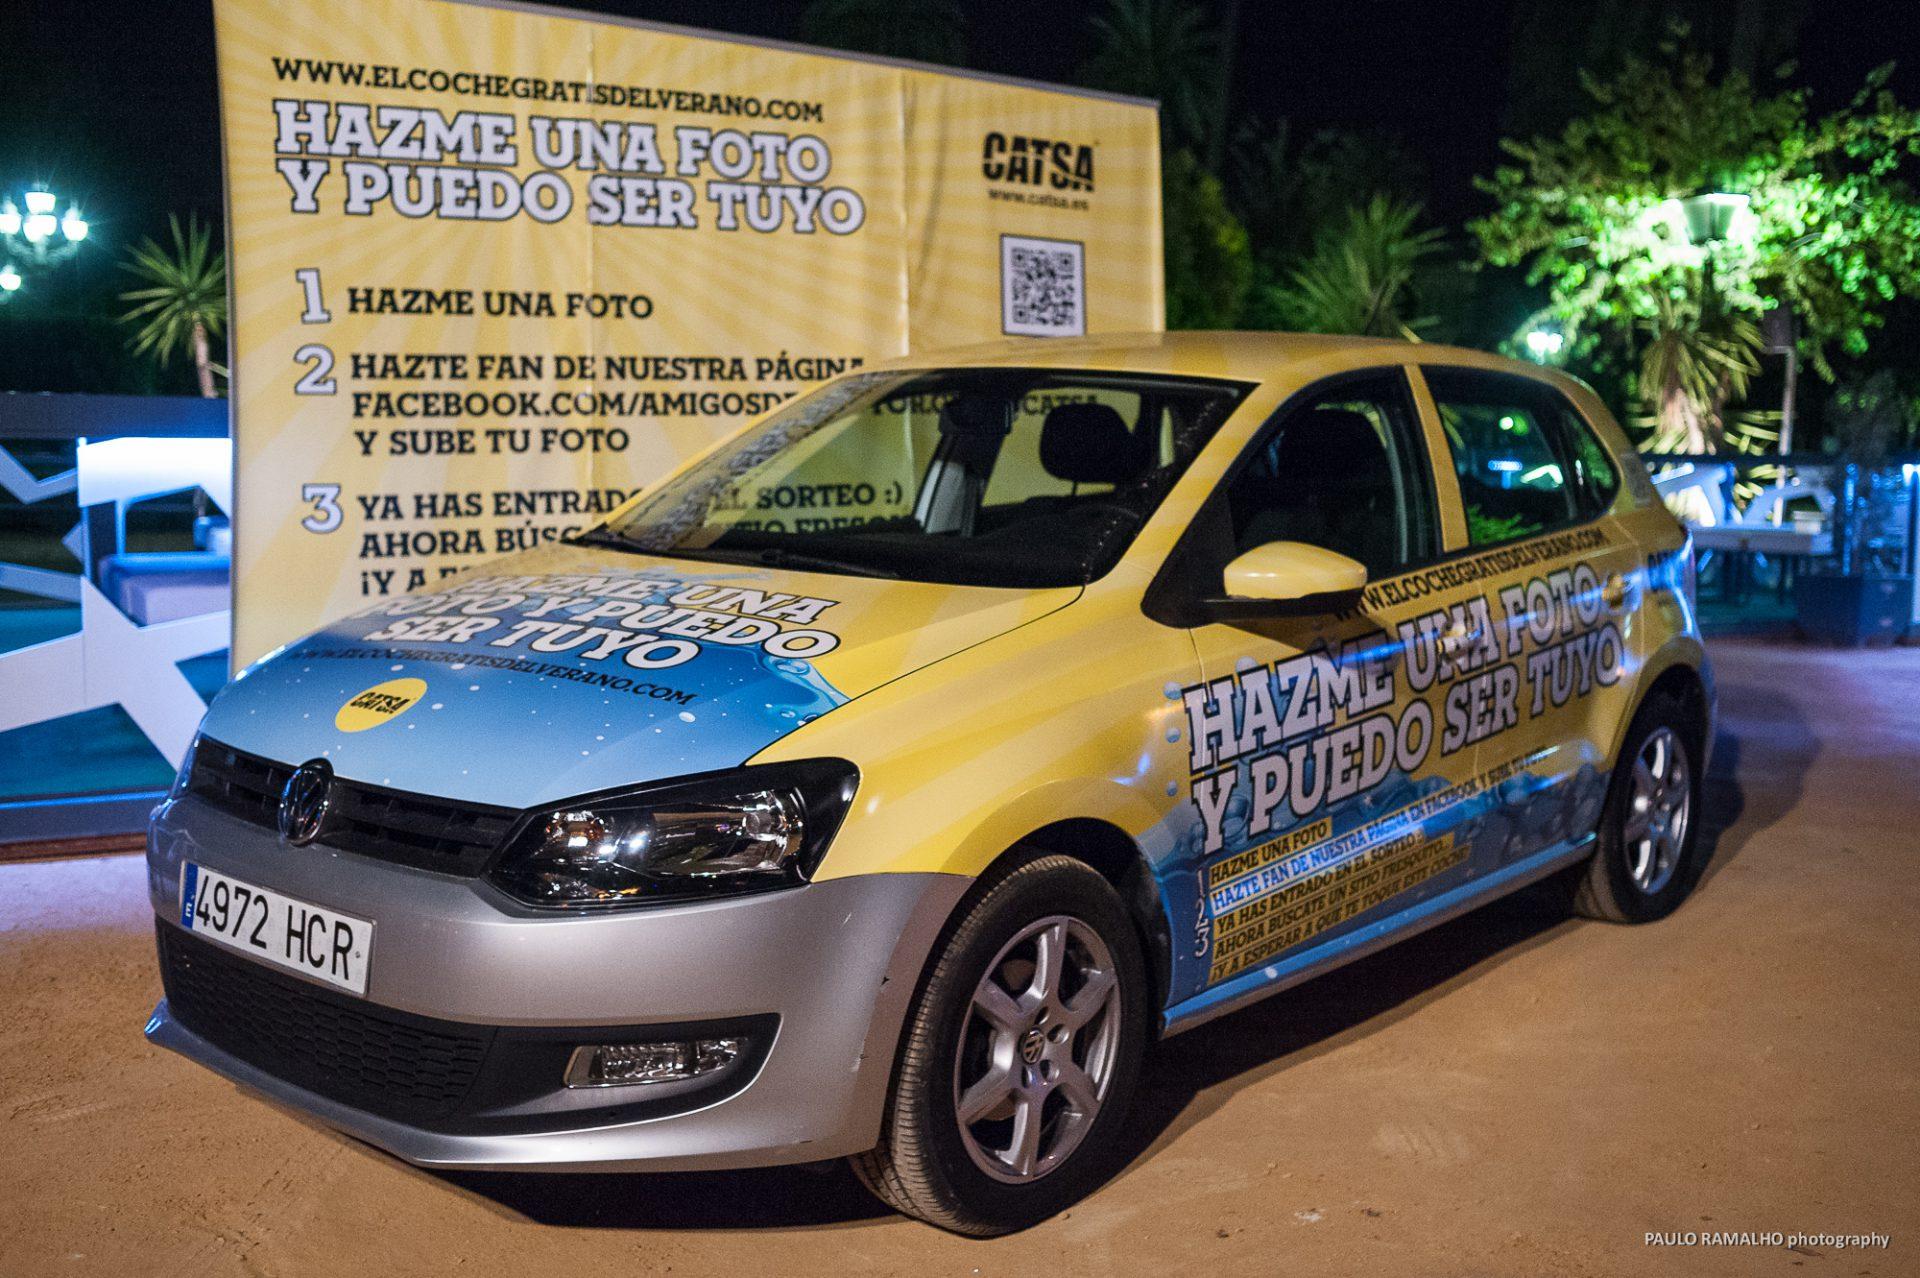 Sorteo coche Grupo Catsa Sevilla | Paulo Ramalho Fotografía Sevilla